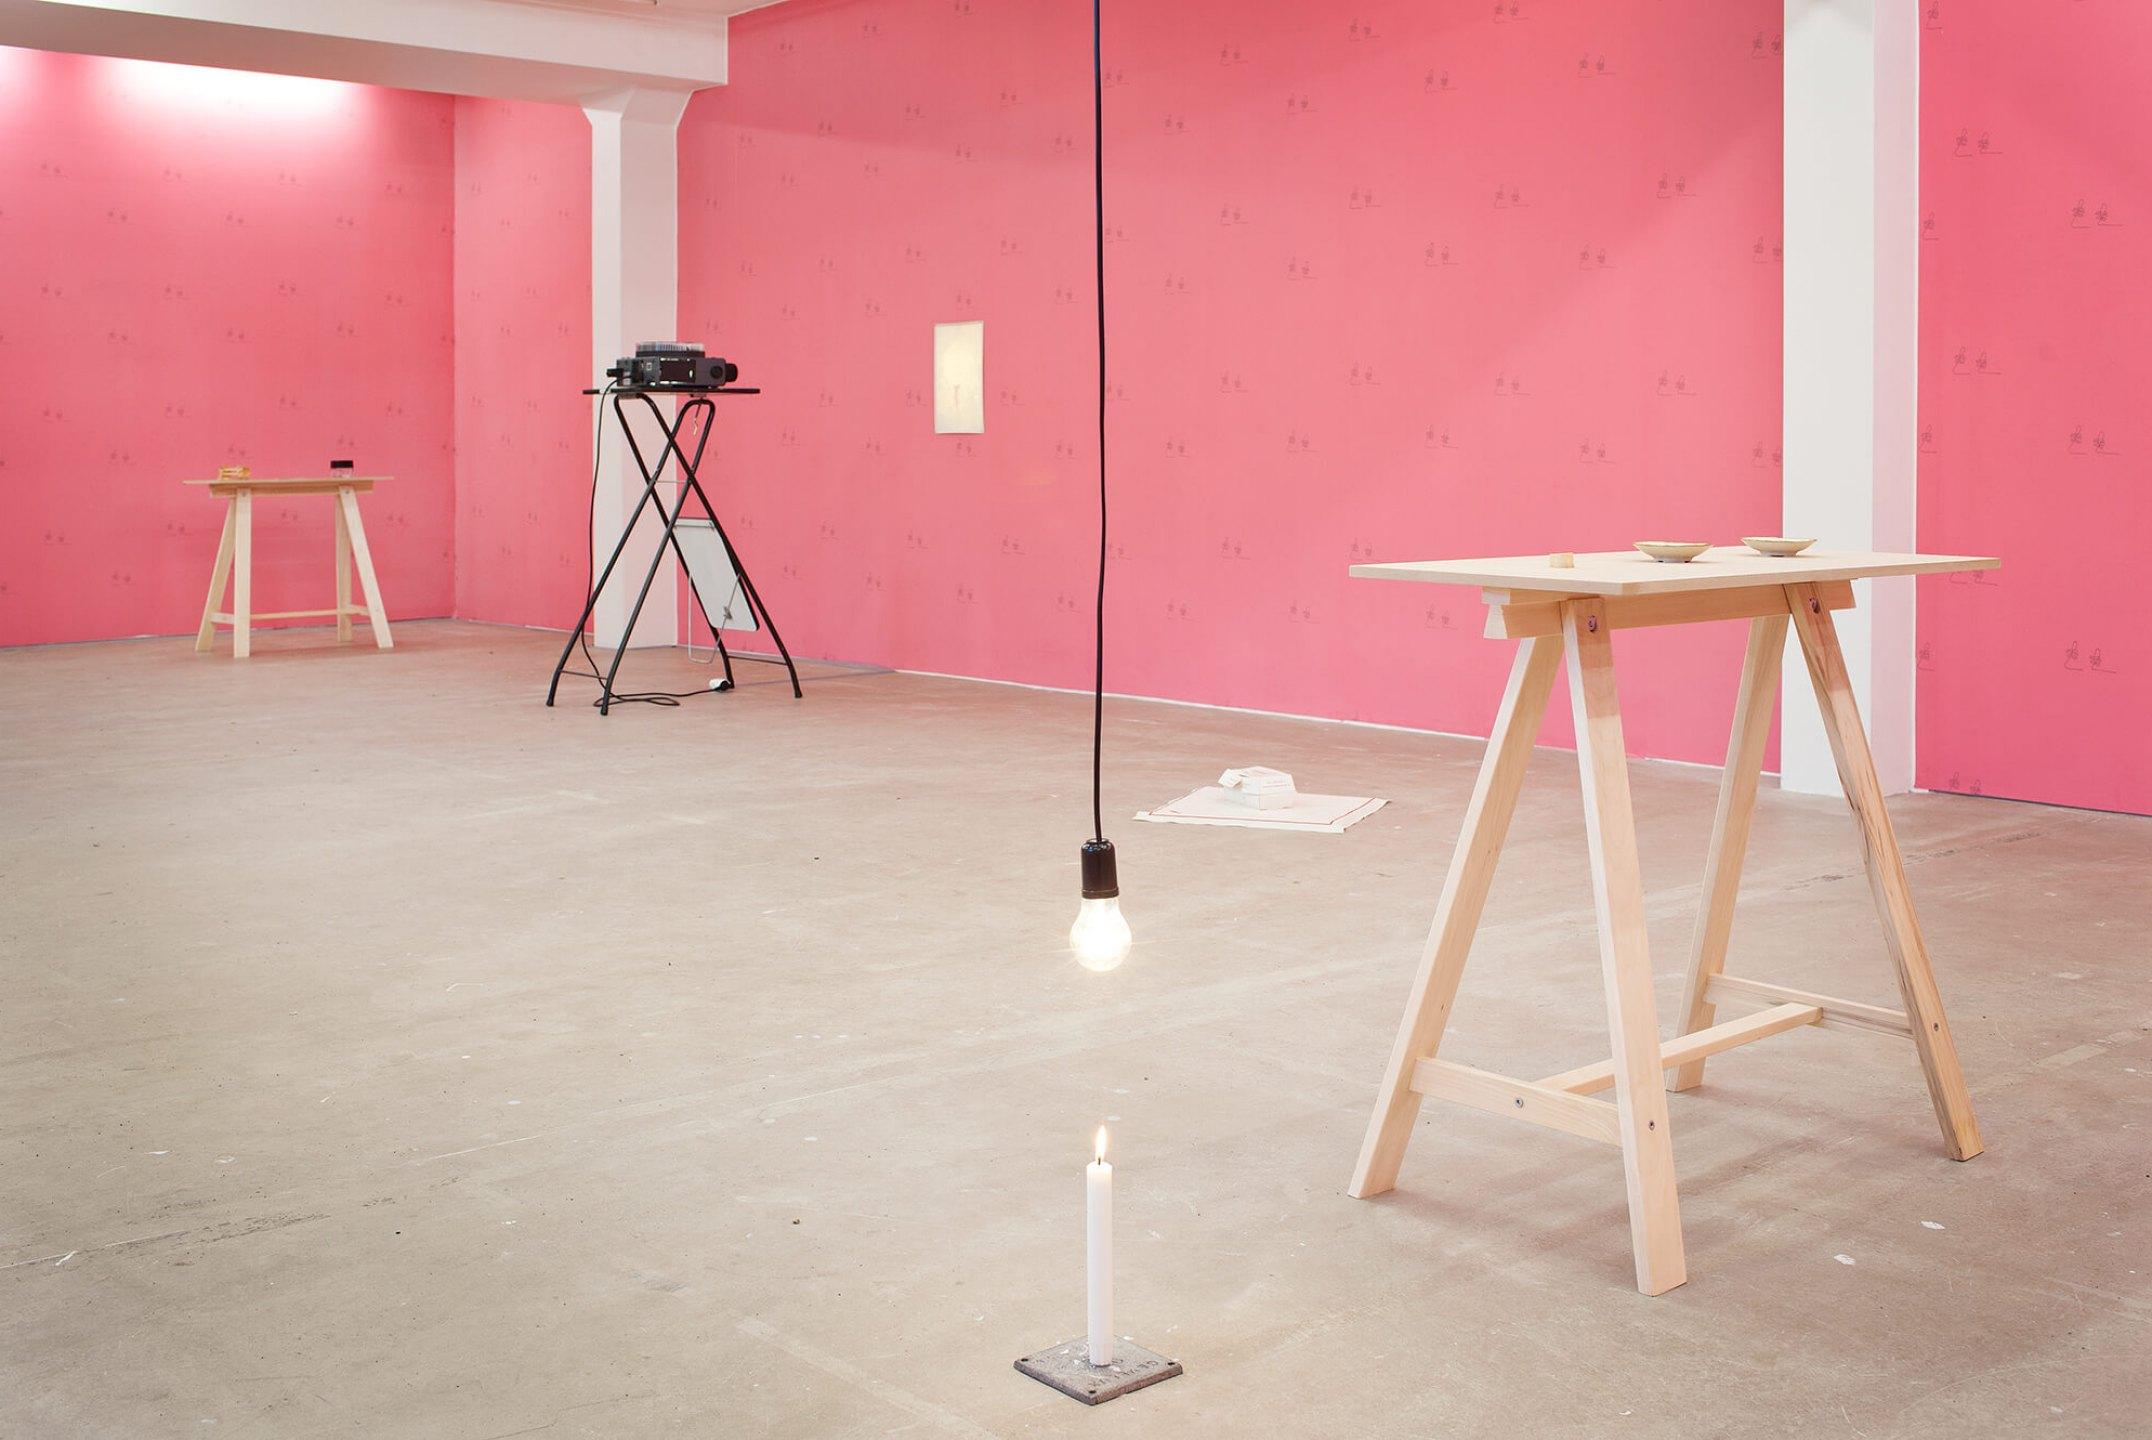 Runo Lagomarsino,<em>Even Heroes Grow Old,Index</em>,The Swedish Contemporary Art Foundation, Stockholm, 2012 - Mendes Wood DM